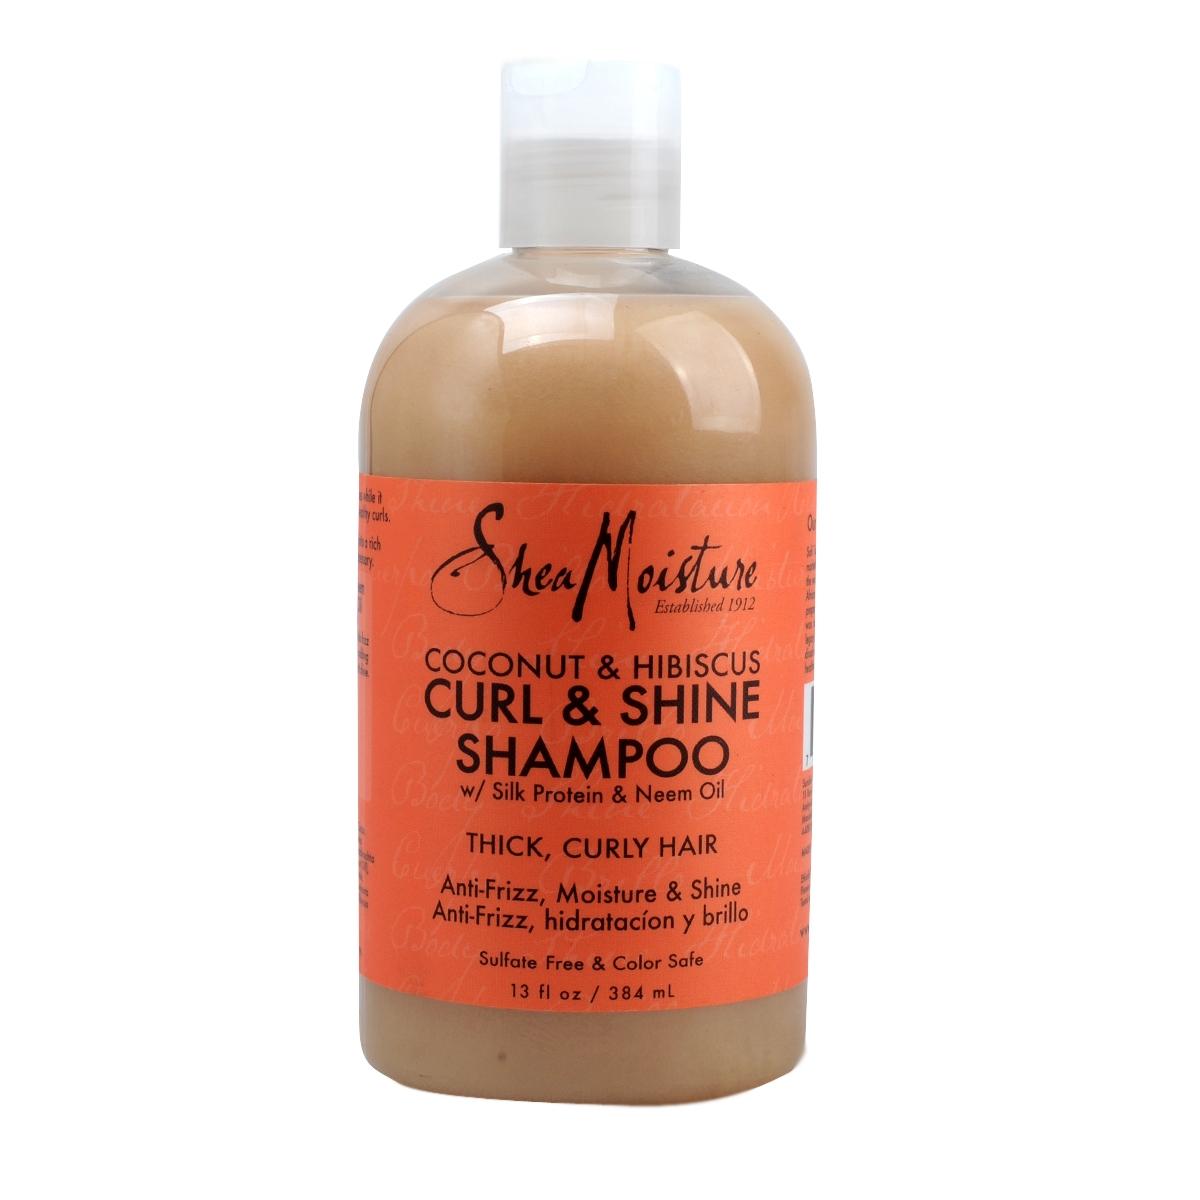 Shea Moisture Coconut Amp Hibiscus Curl Amp Shine Shampoo Olori